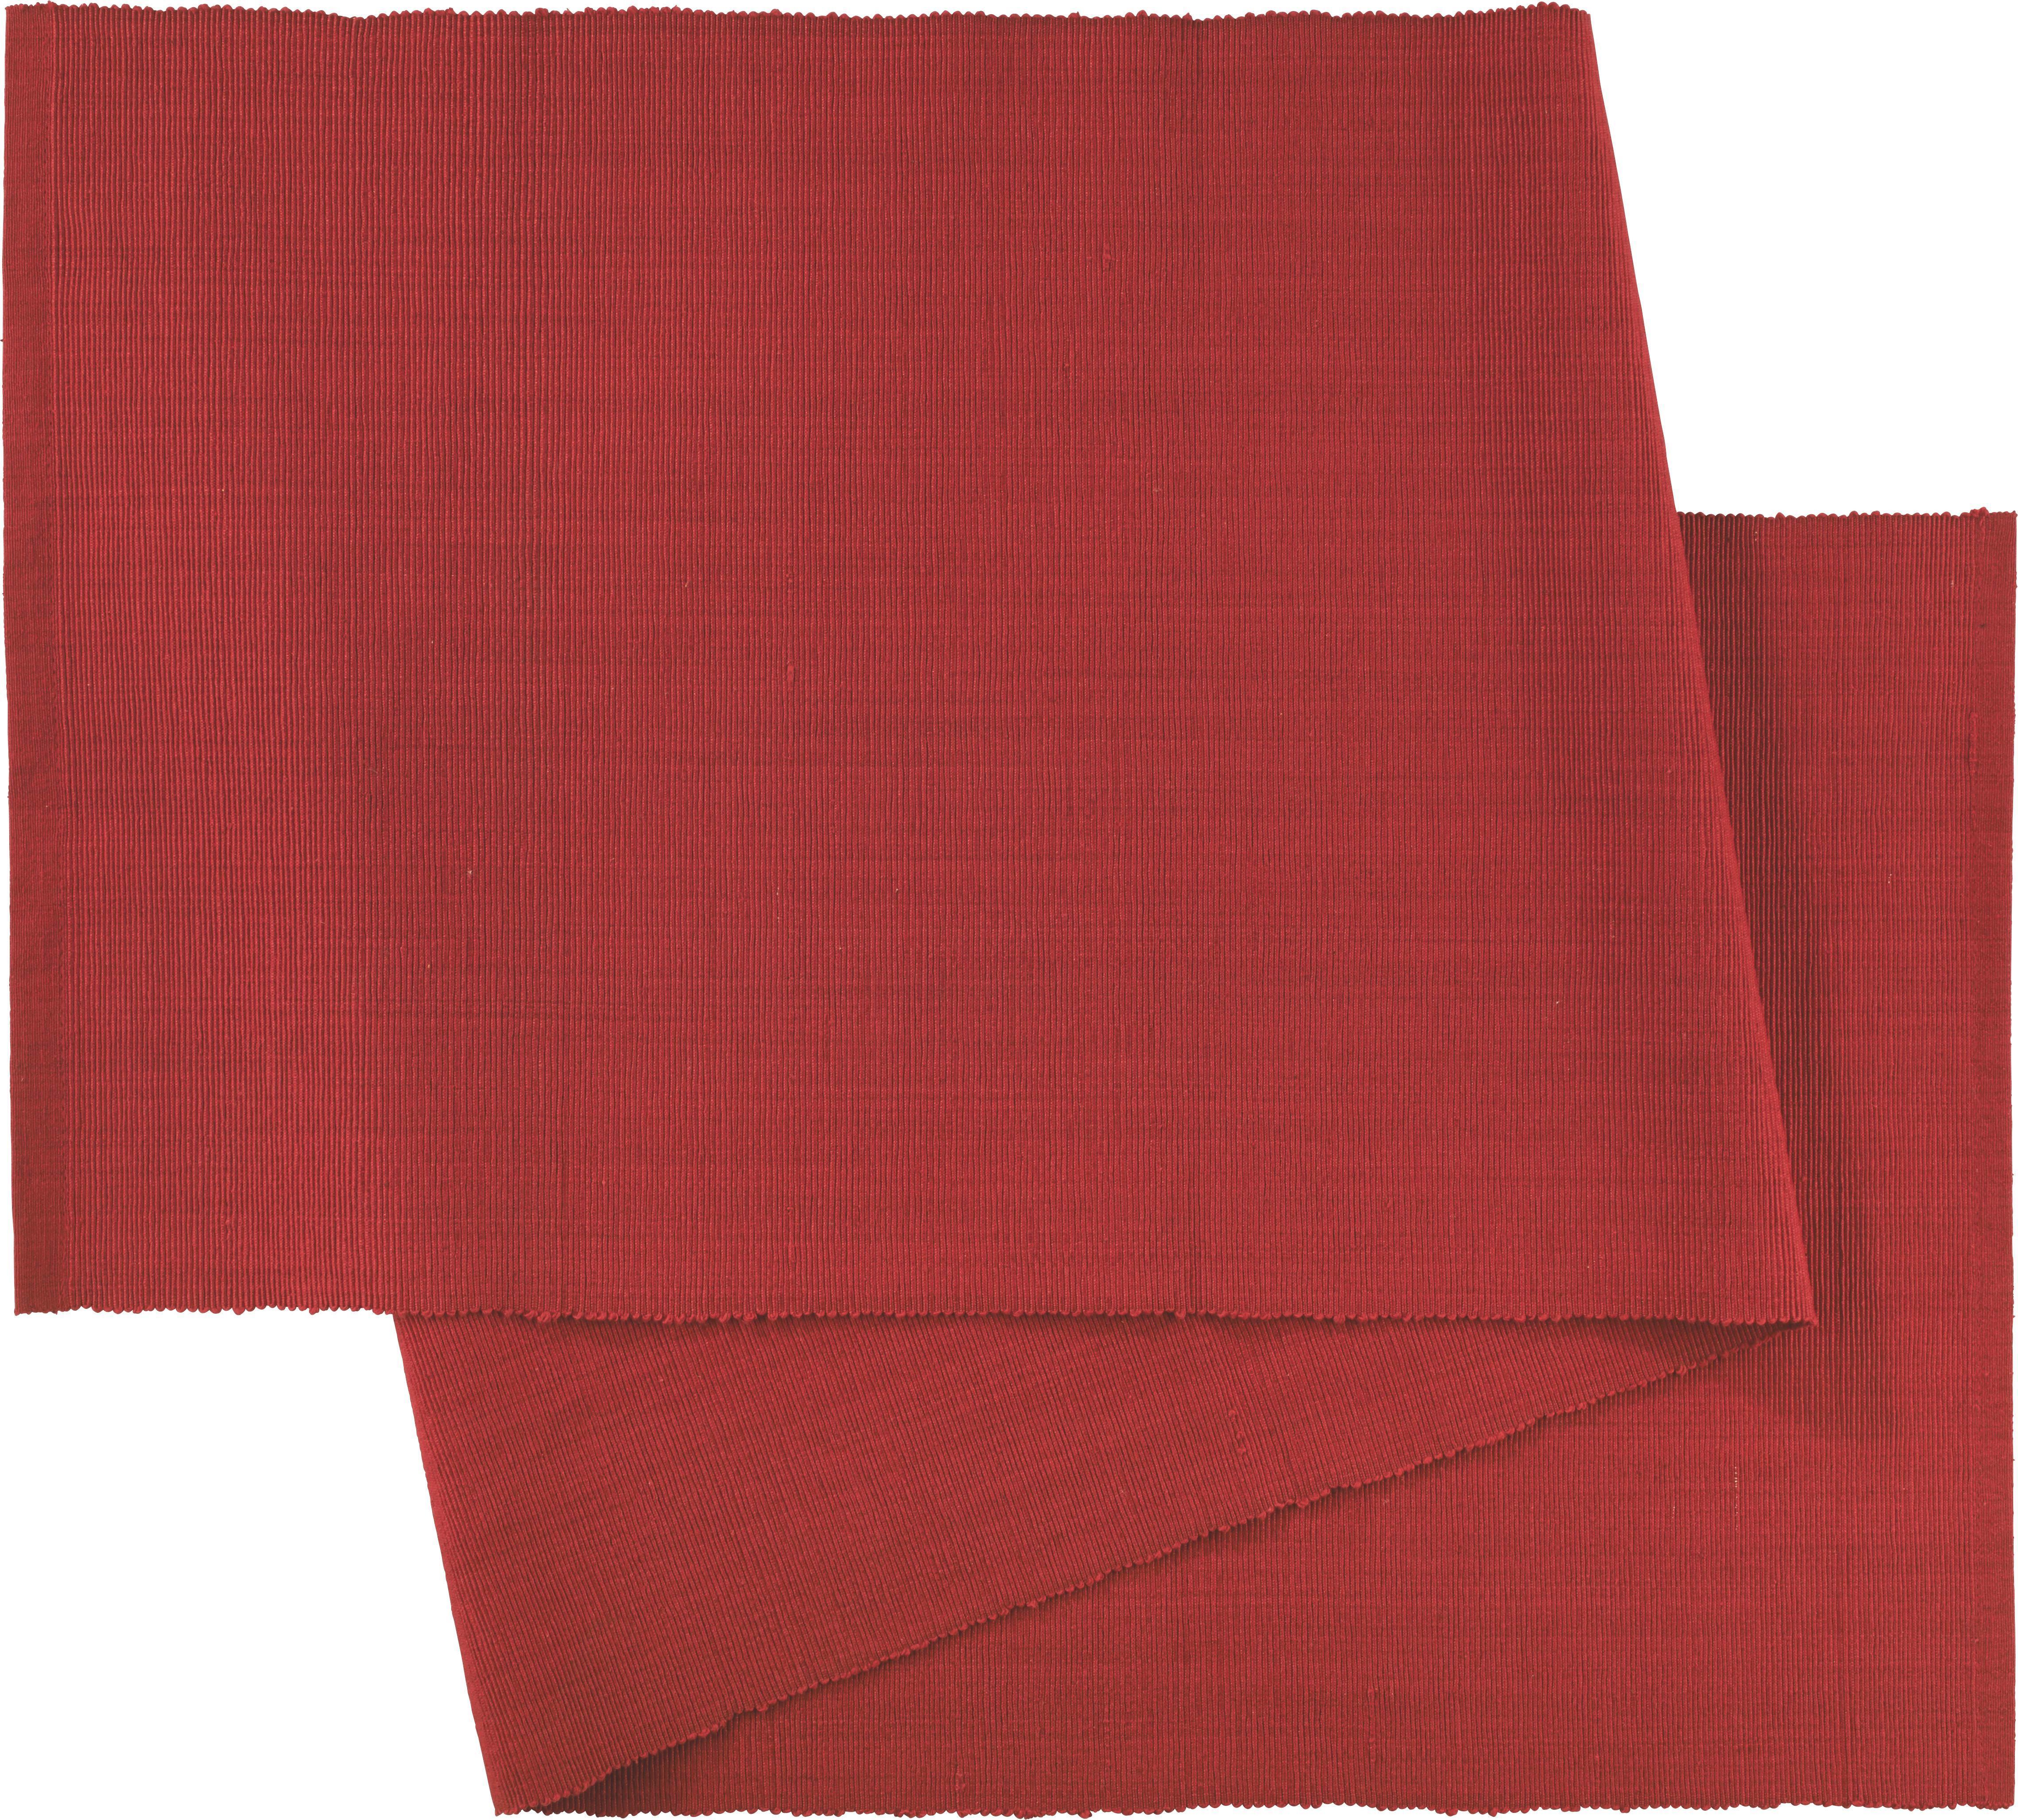 Nadprt Maren - rdeča, tekstil (40X/150cm) - MÖMAX modern living